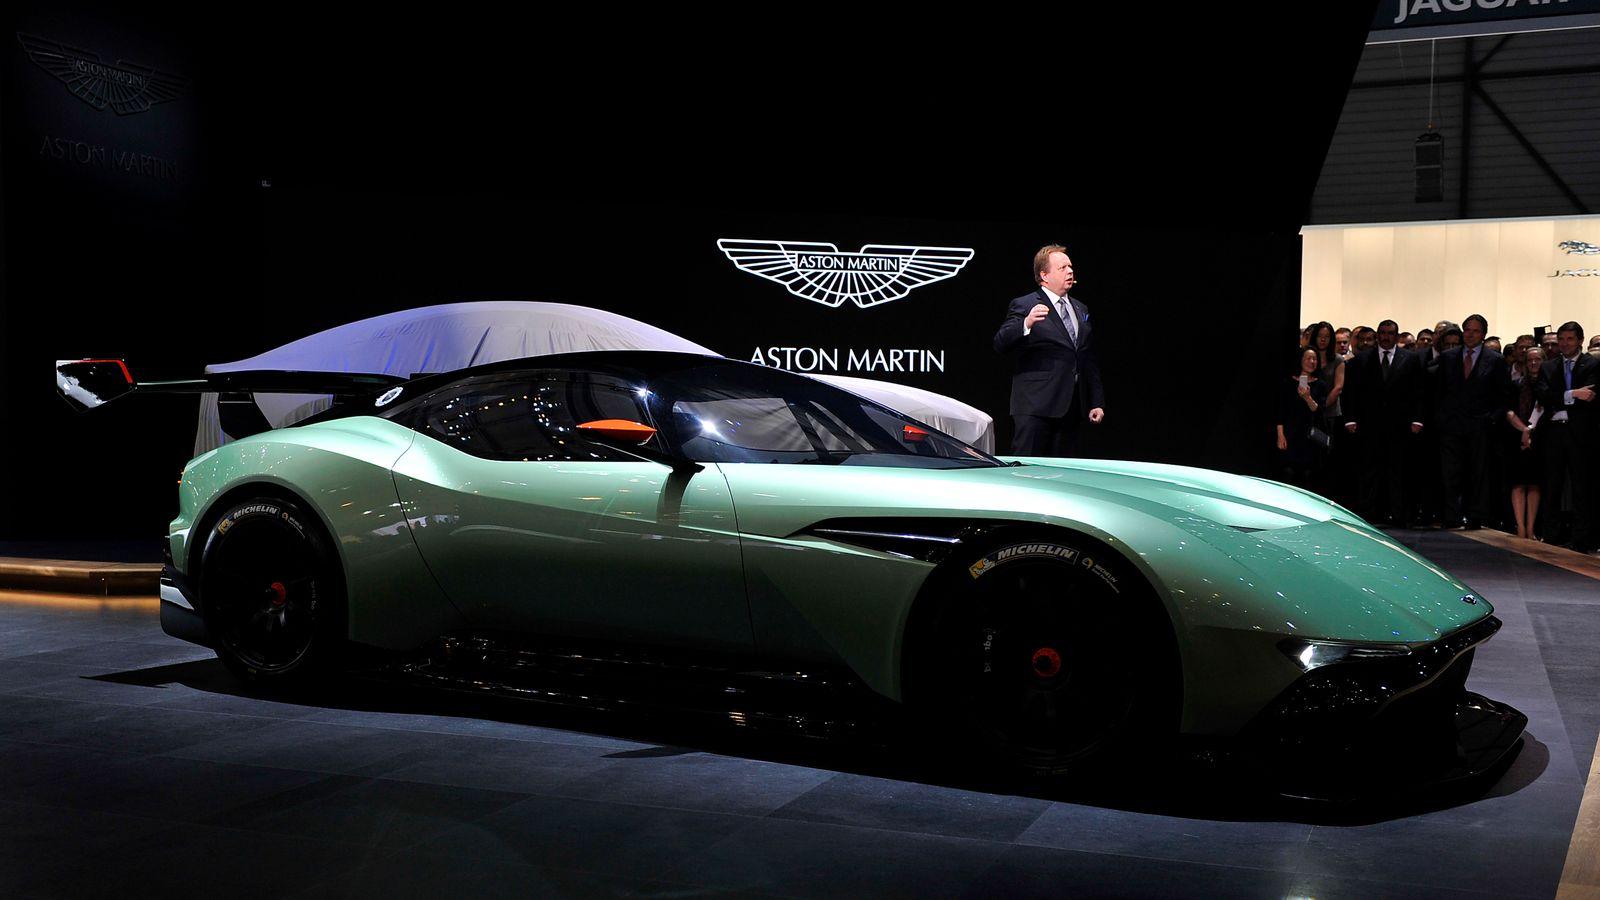 Aston Martin shares skid on market debut